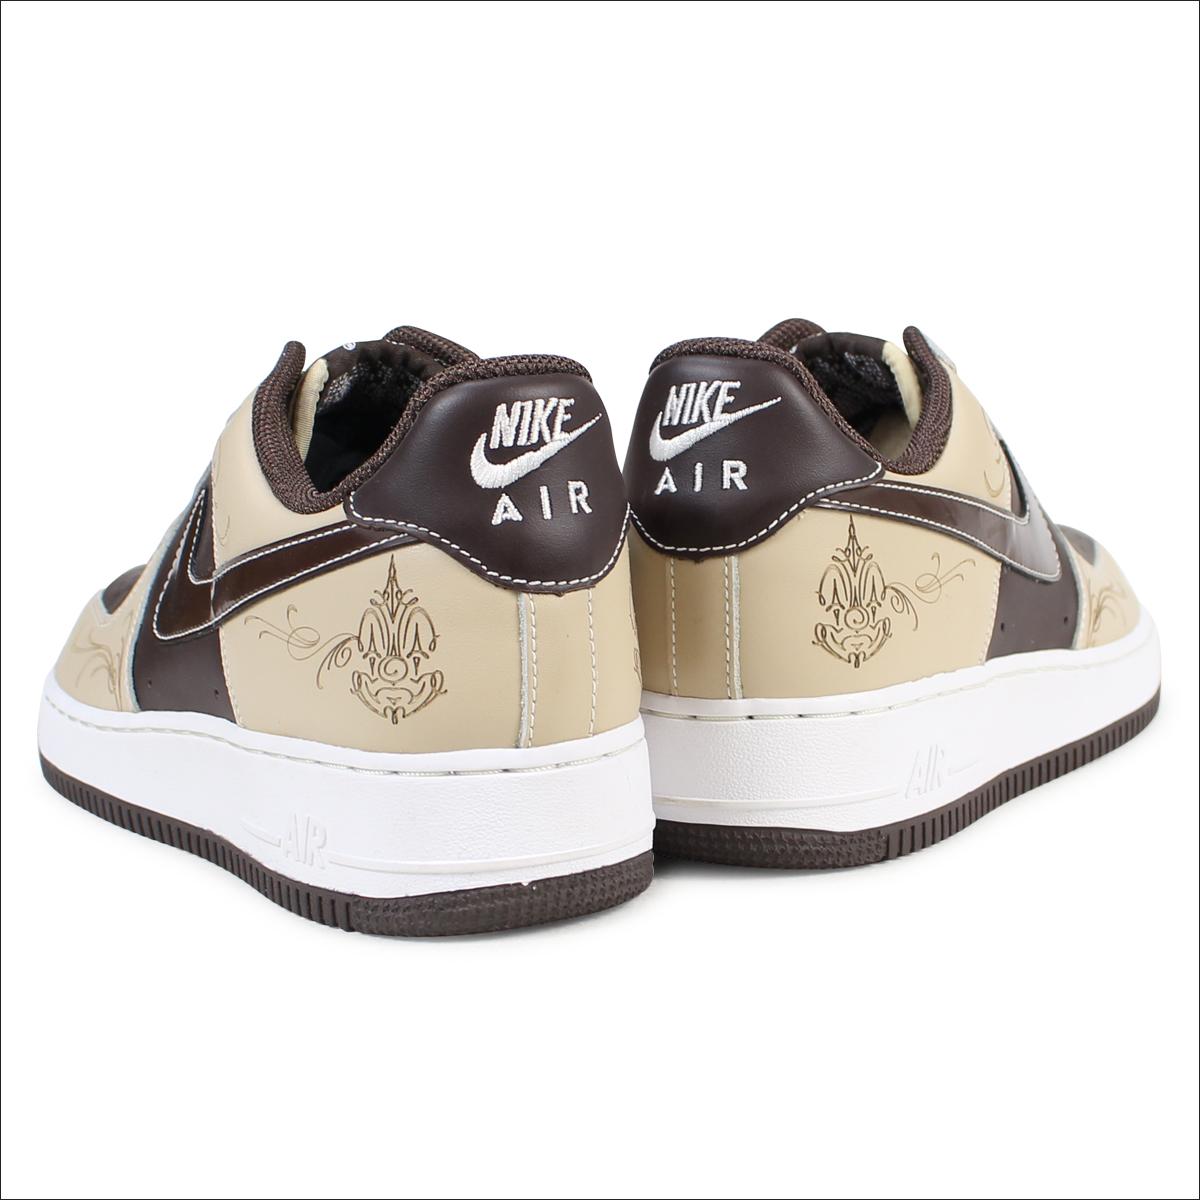 NIKE AIR FORCE 1 MR CARTOON Nike air force 1 sneakers 307,334 221 men's shoes brown